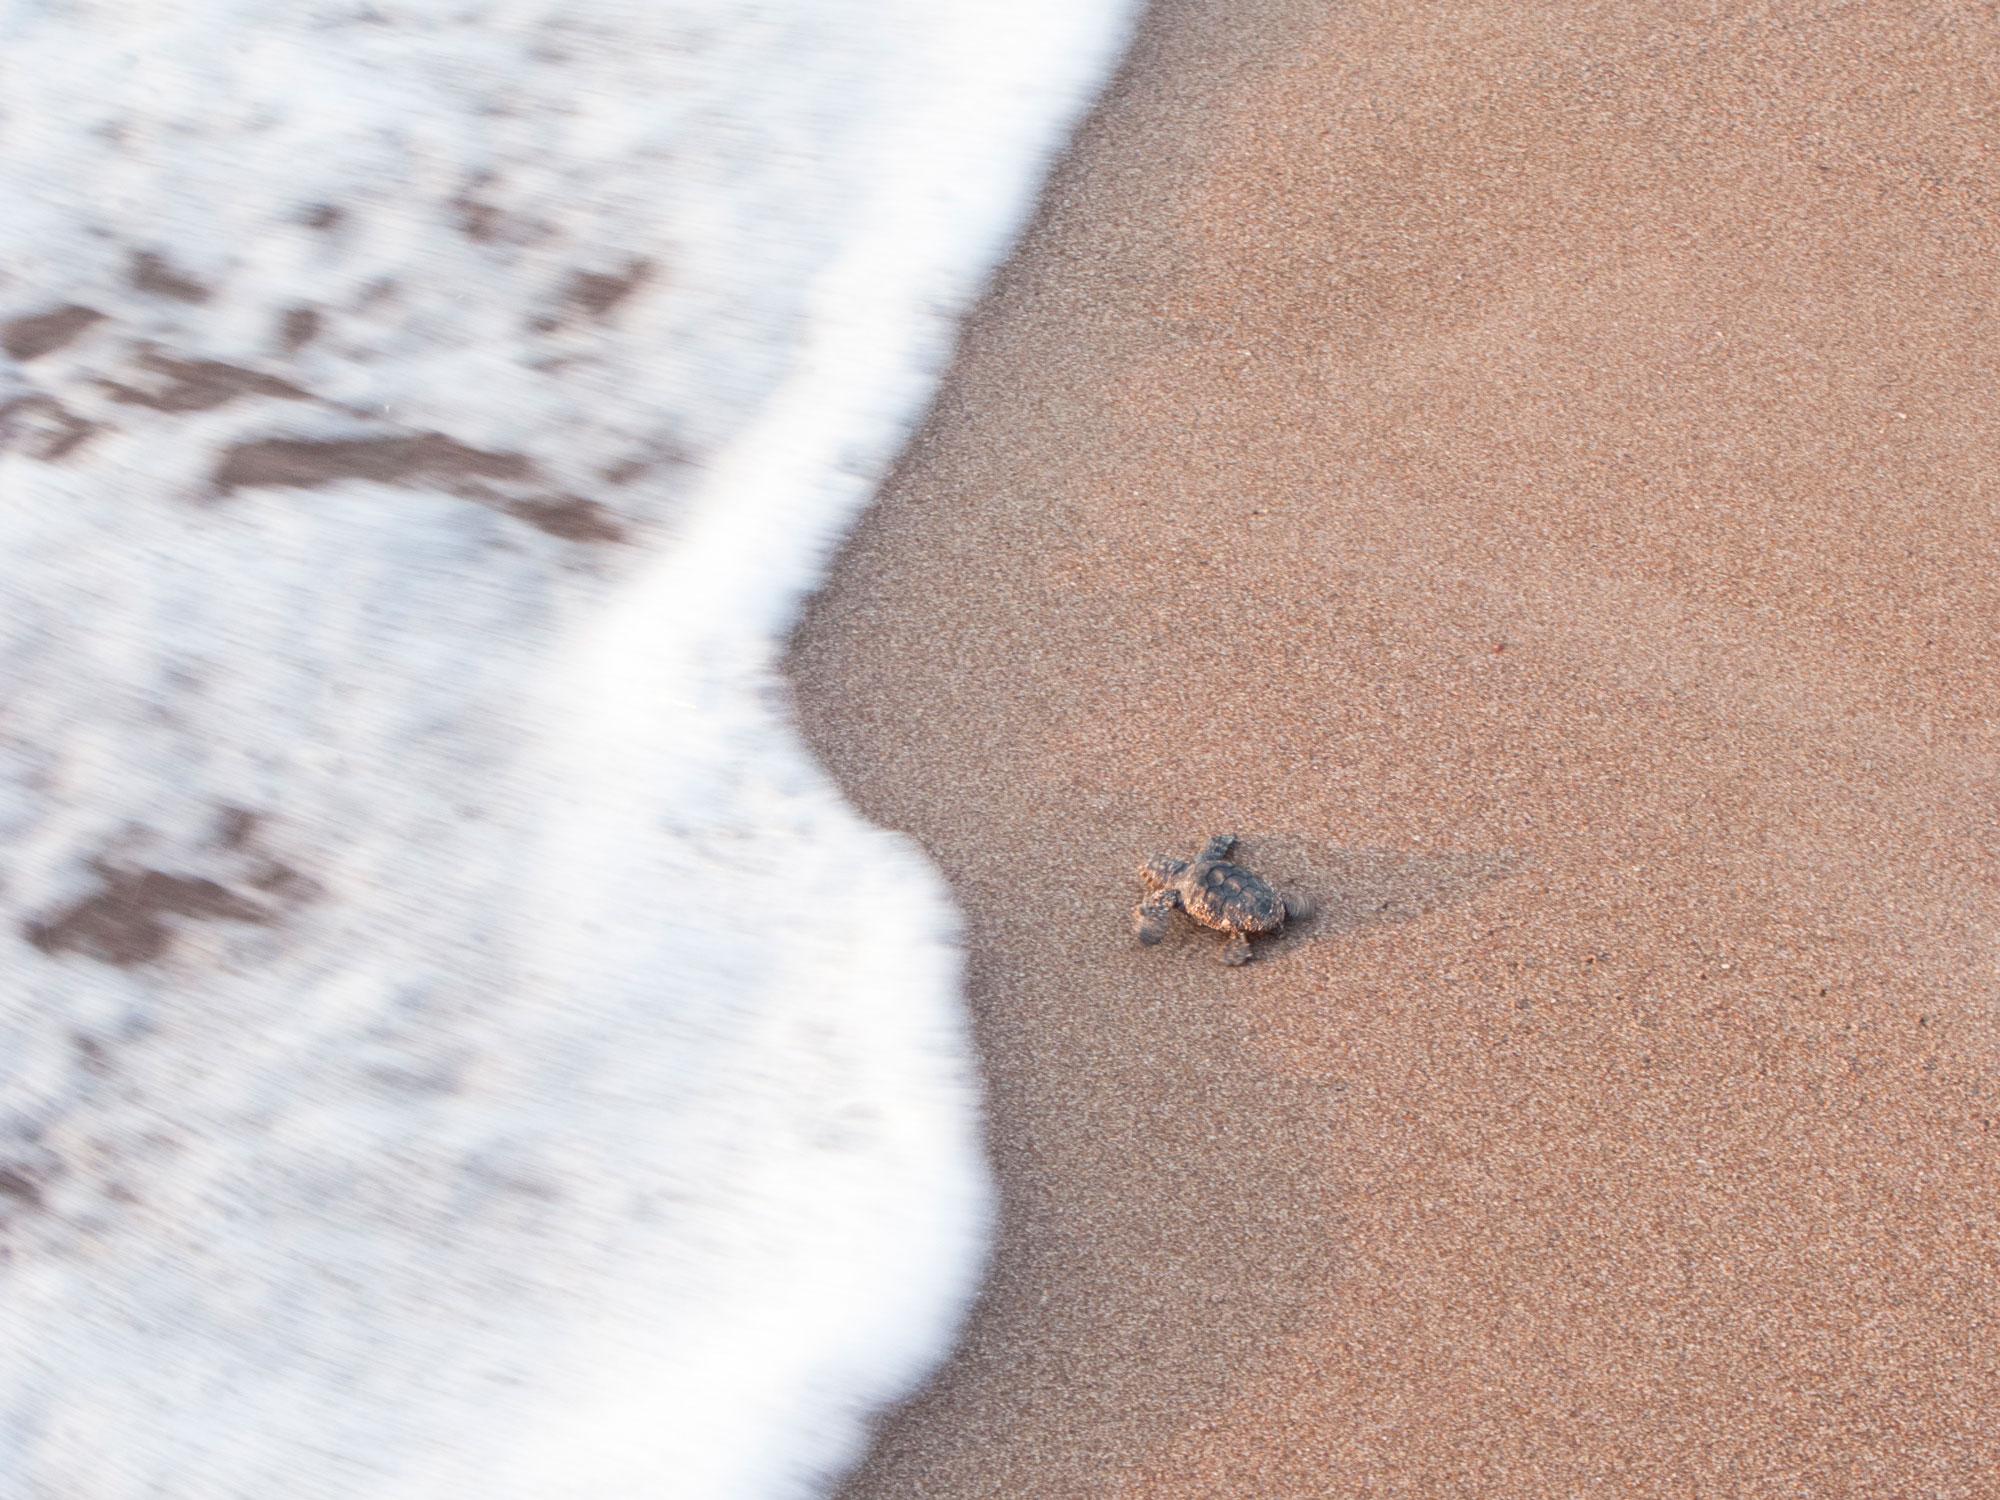 Turkey Cirali Caretta caretta turtle